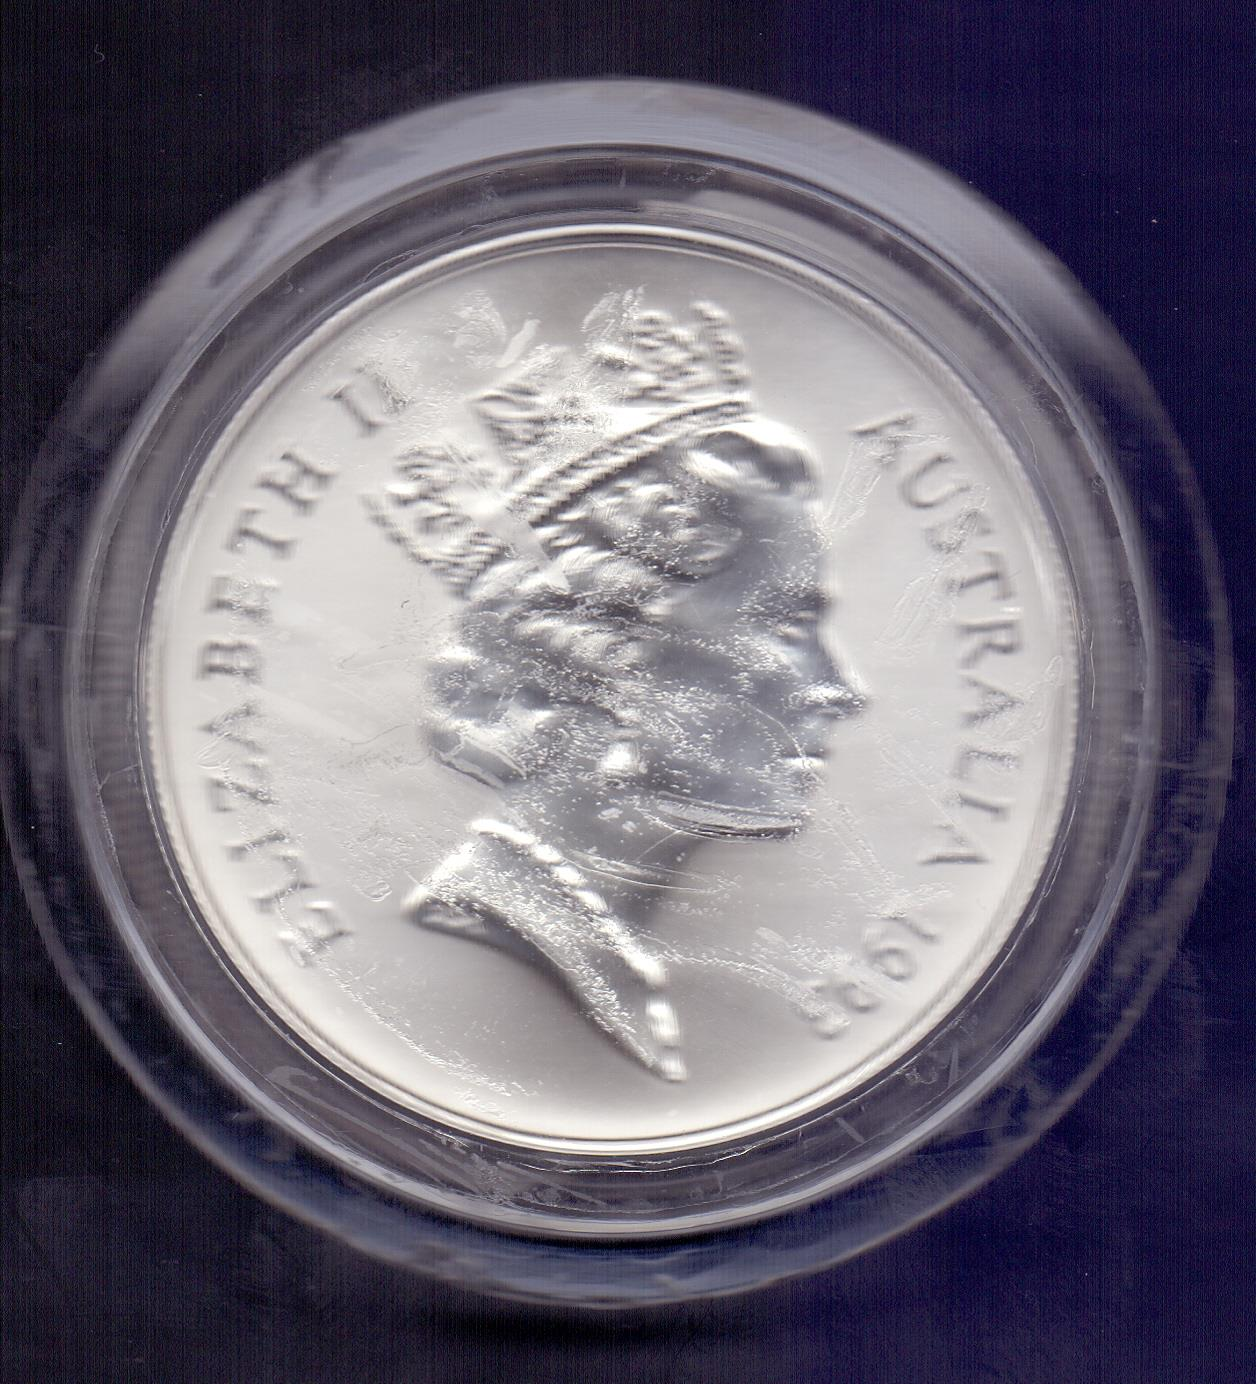 Lot 132 - COINS : Australia 1993 1oz Silver Kangar